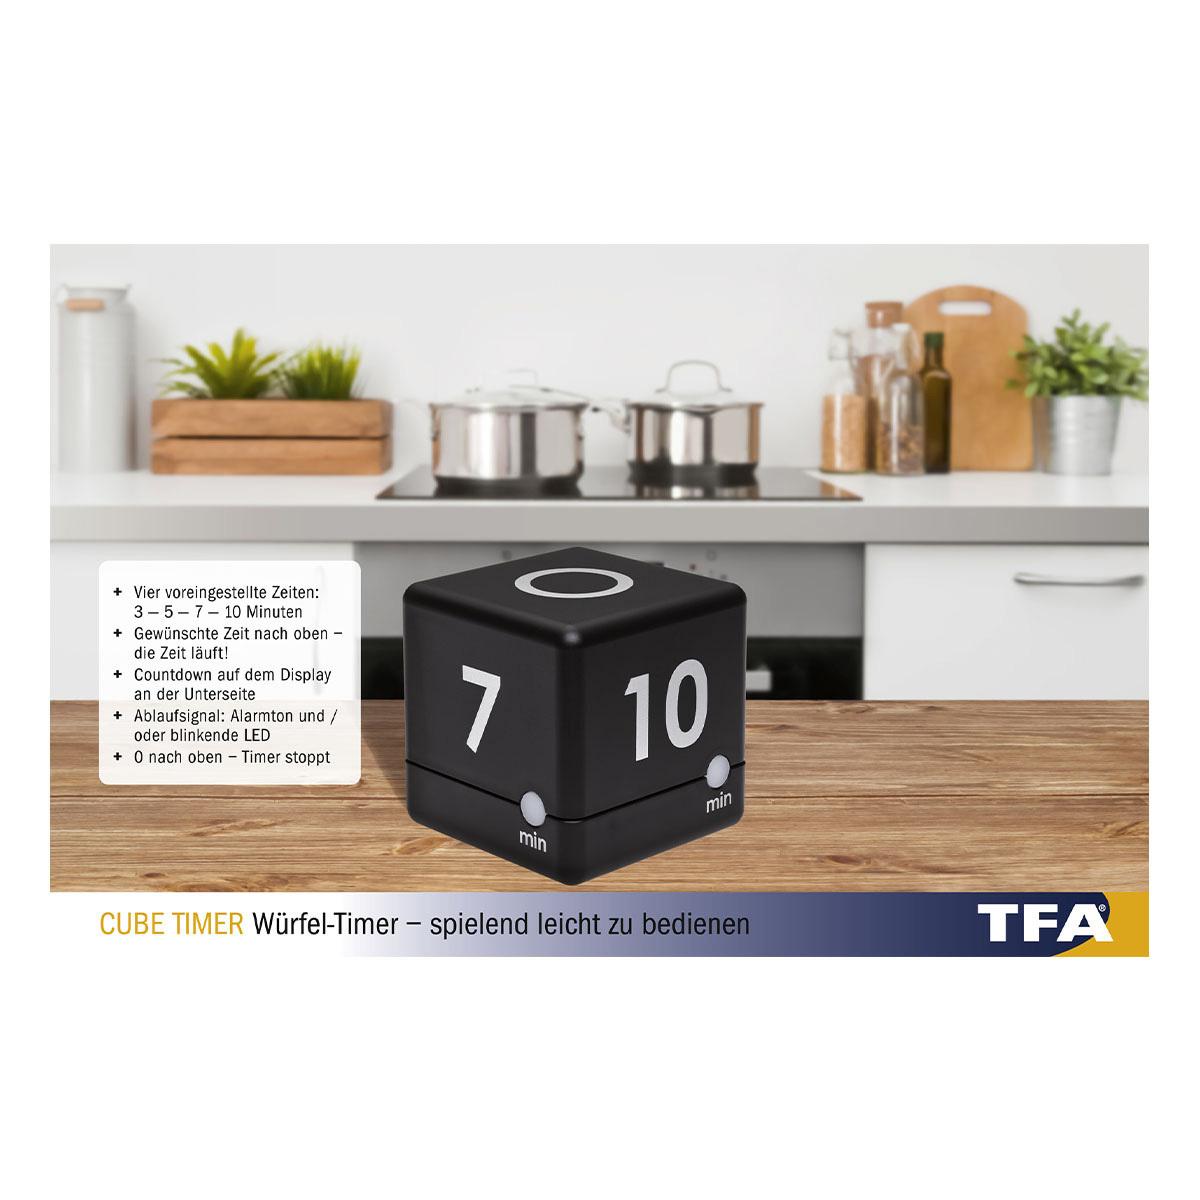 38-2040-01-digitaler-würfel-timer-cube-timer-vorteile-1200x1200px.jpg